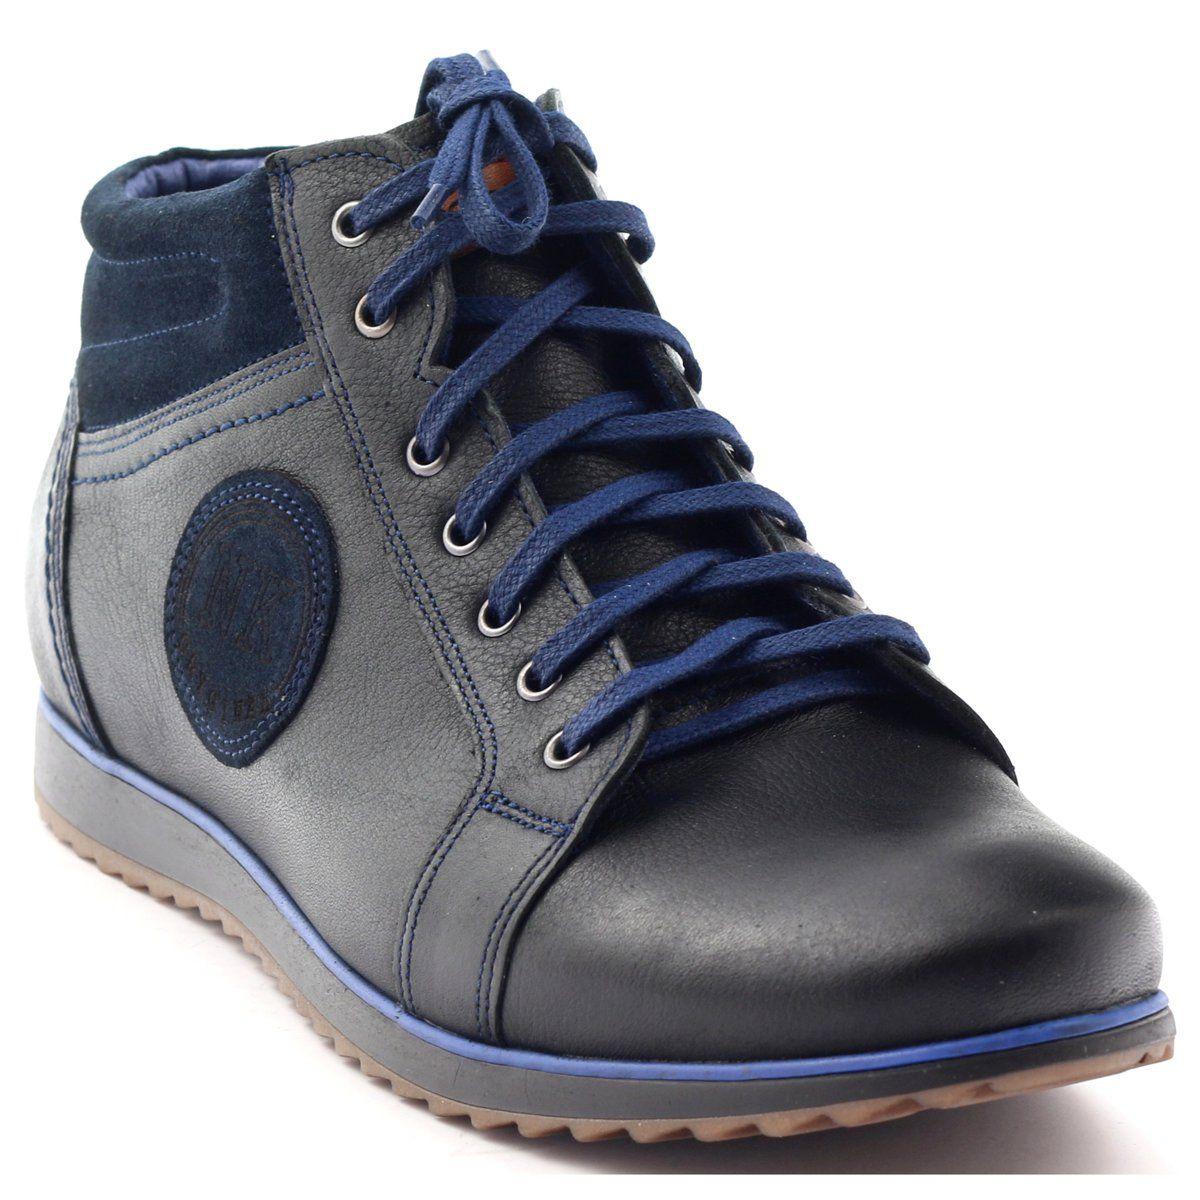 Trzewiki Meskie Zimowe Nikopol 653 Czarne Granatowe High Top Sneakers Hiking Boots Boots